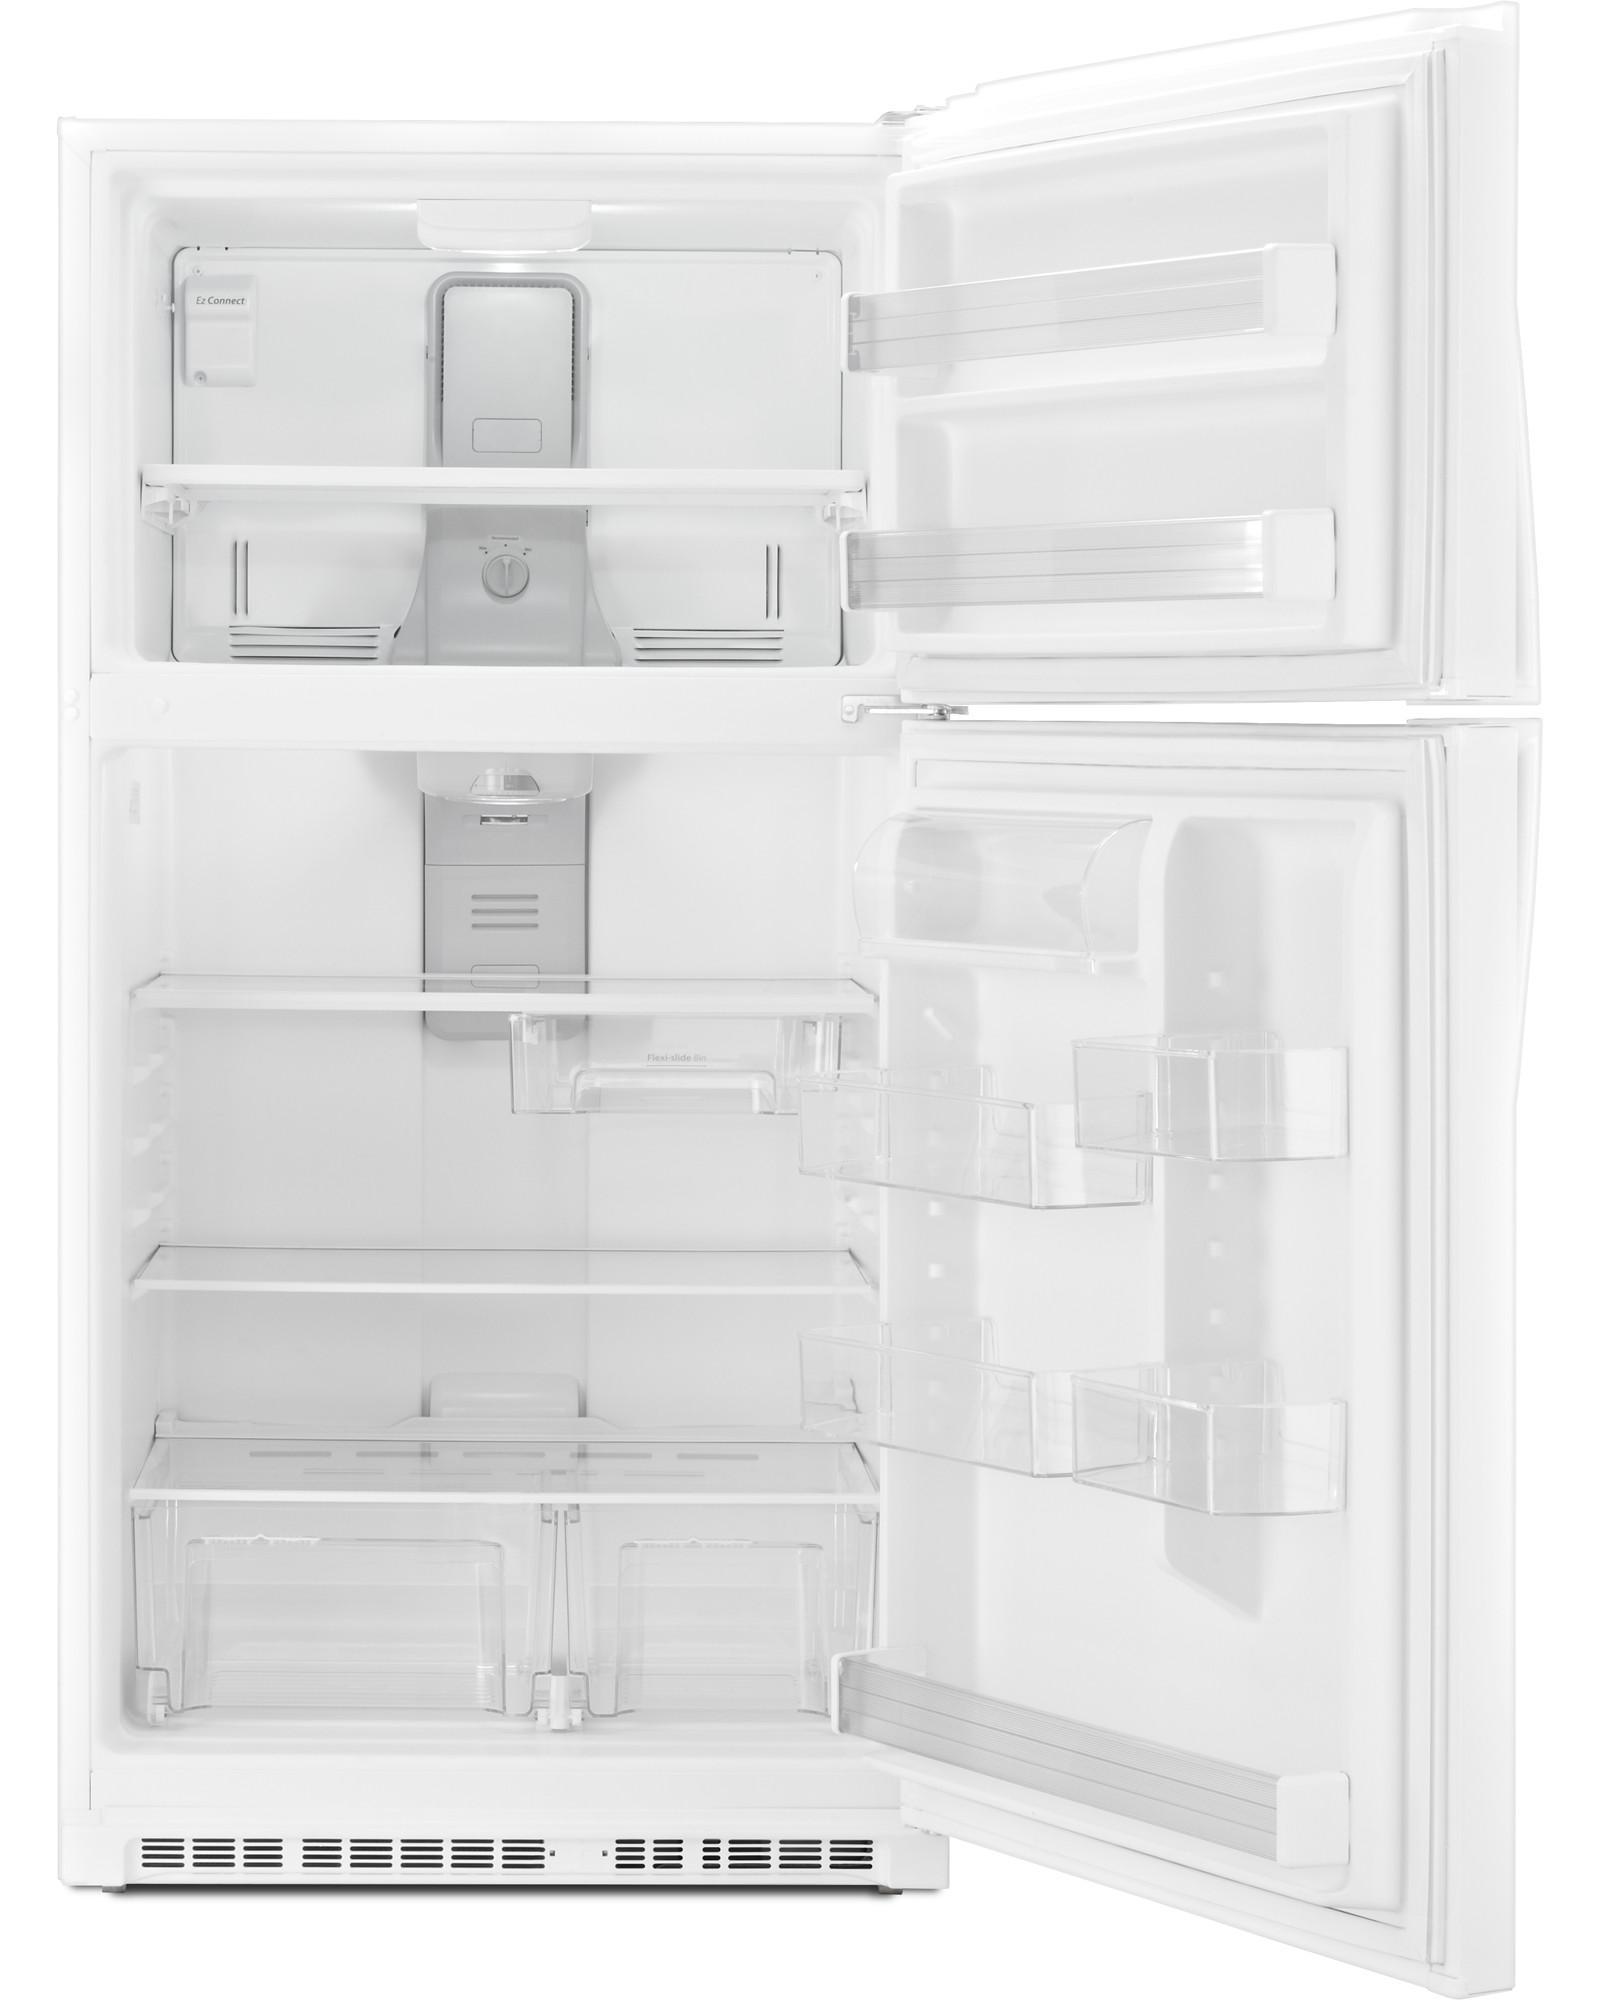 Whirlpool WRT511SZDW 21 cu. ft. Top Freezer Refrigerator w/ LED Interior Lighting - White